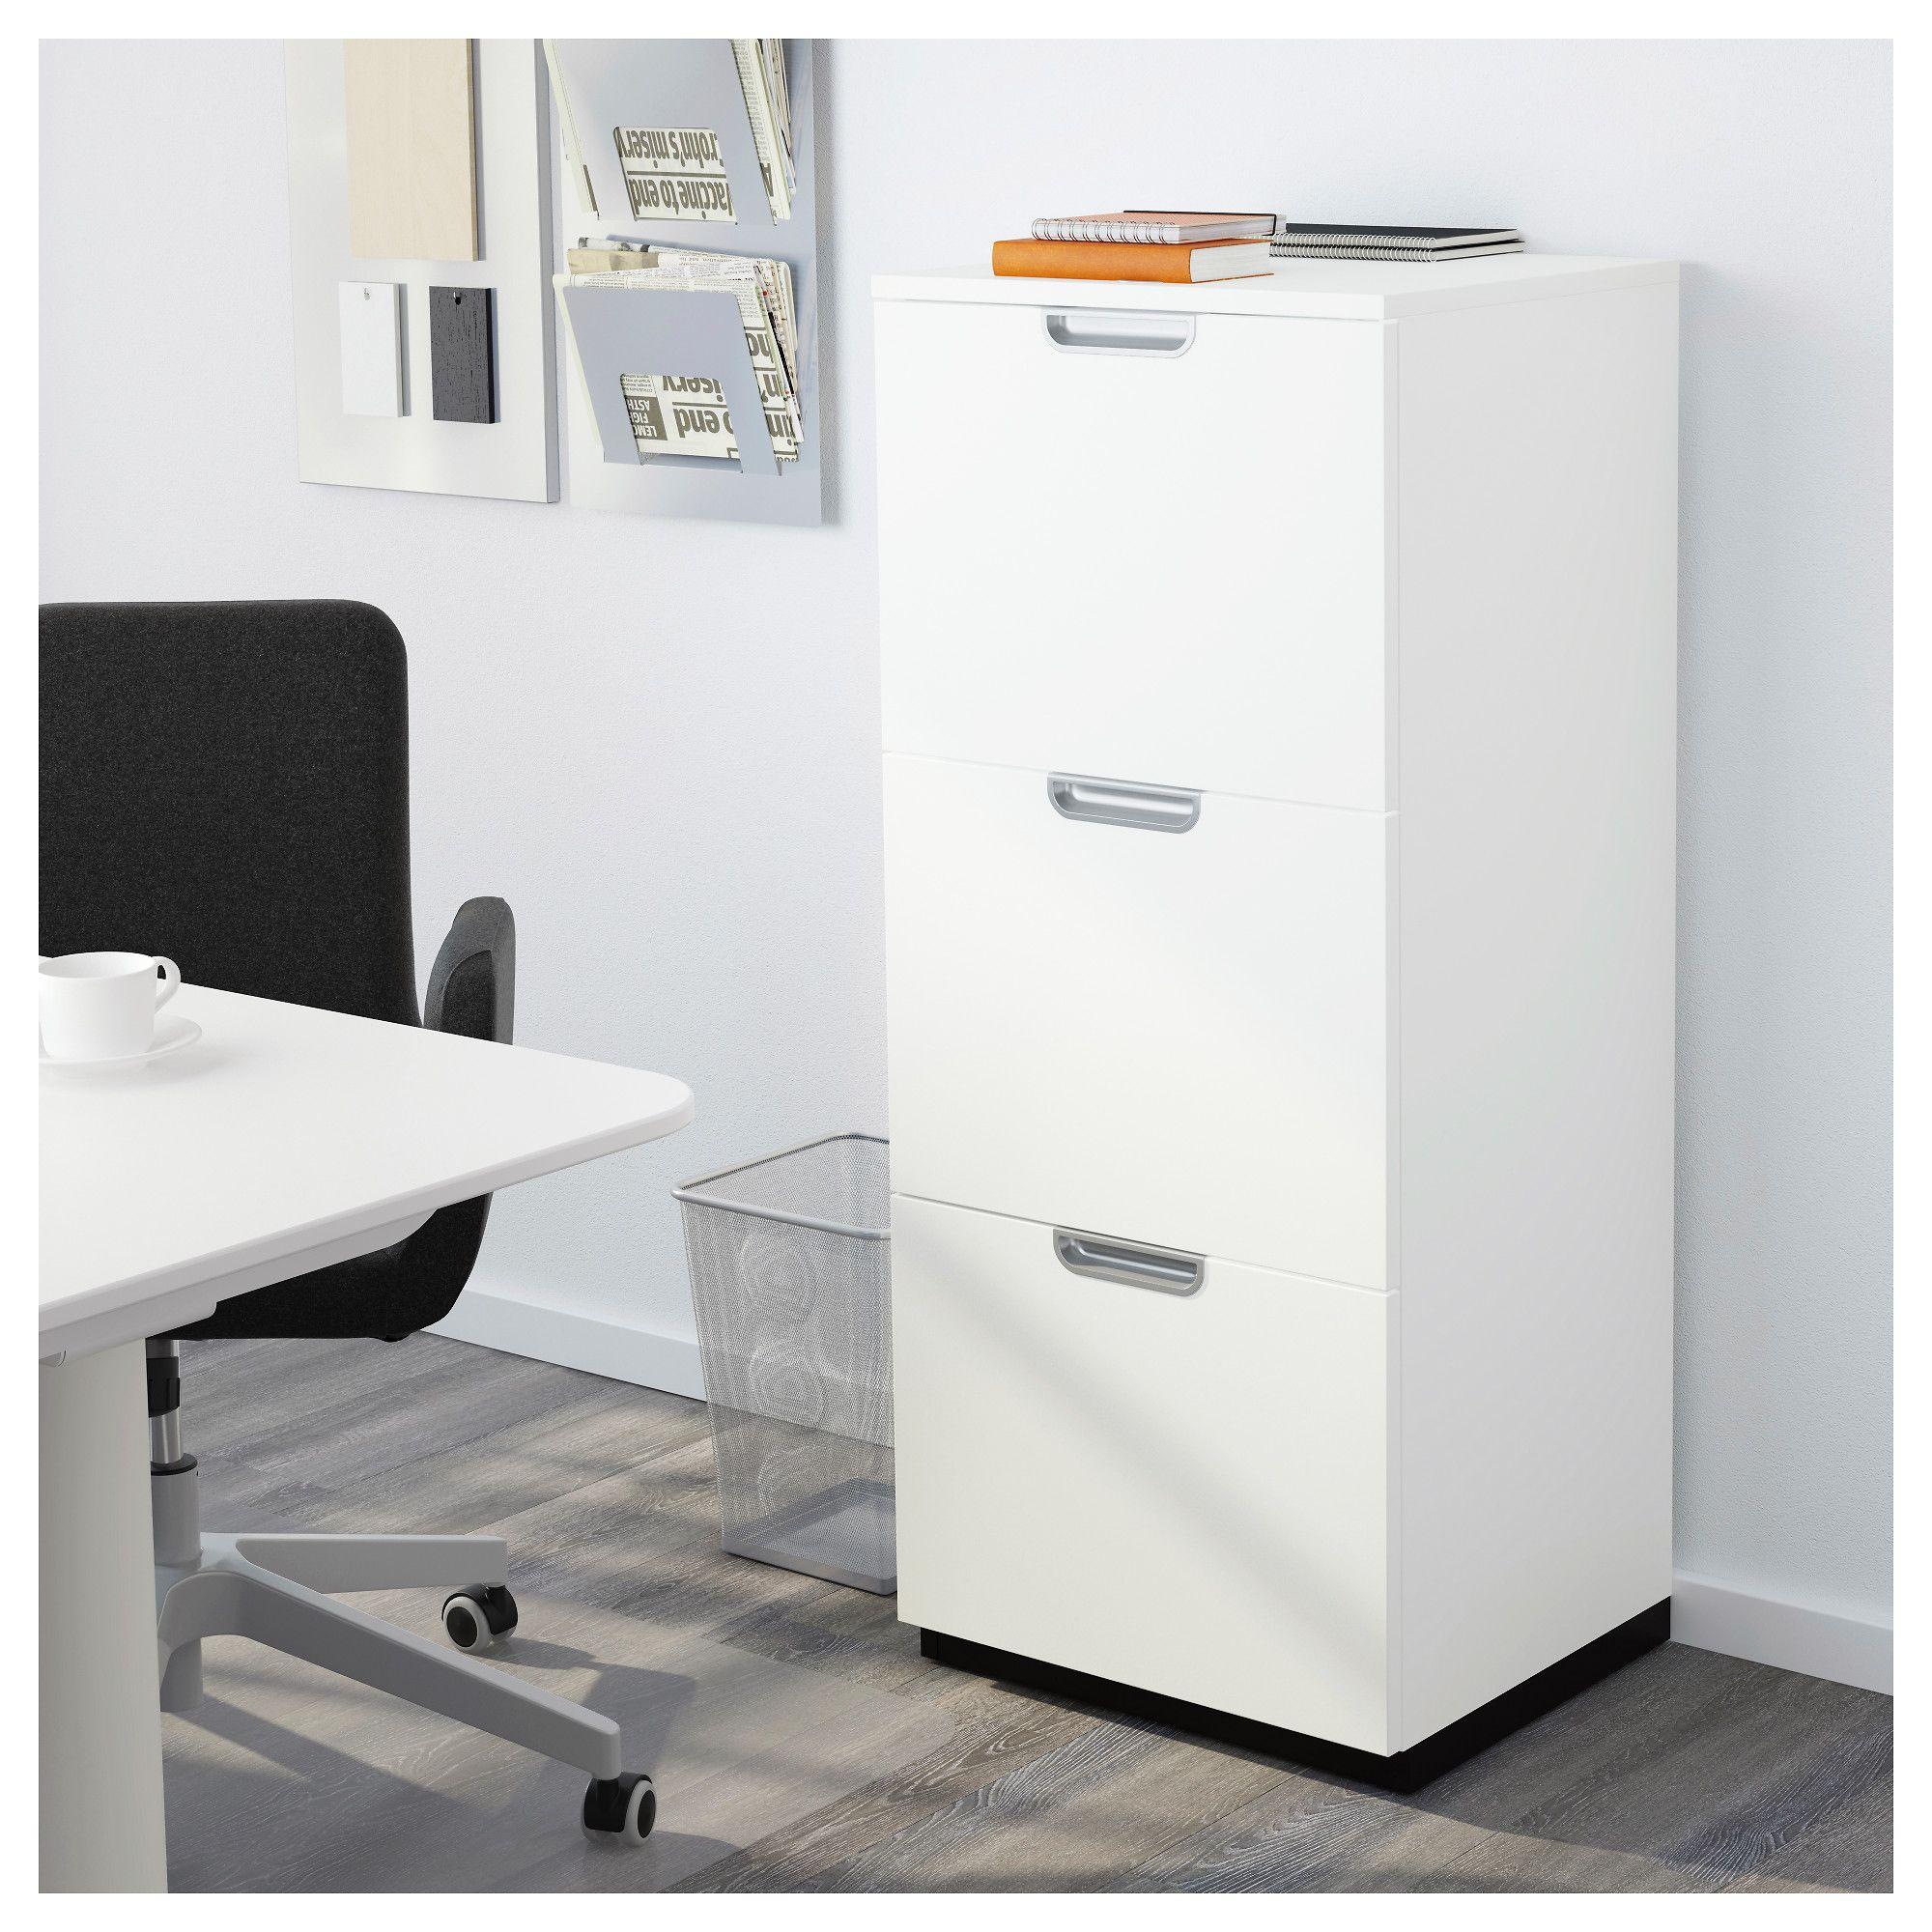 Ikea Galant File Cabinet White